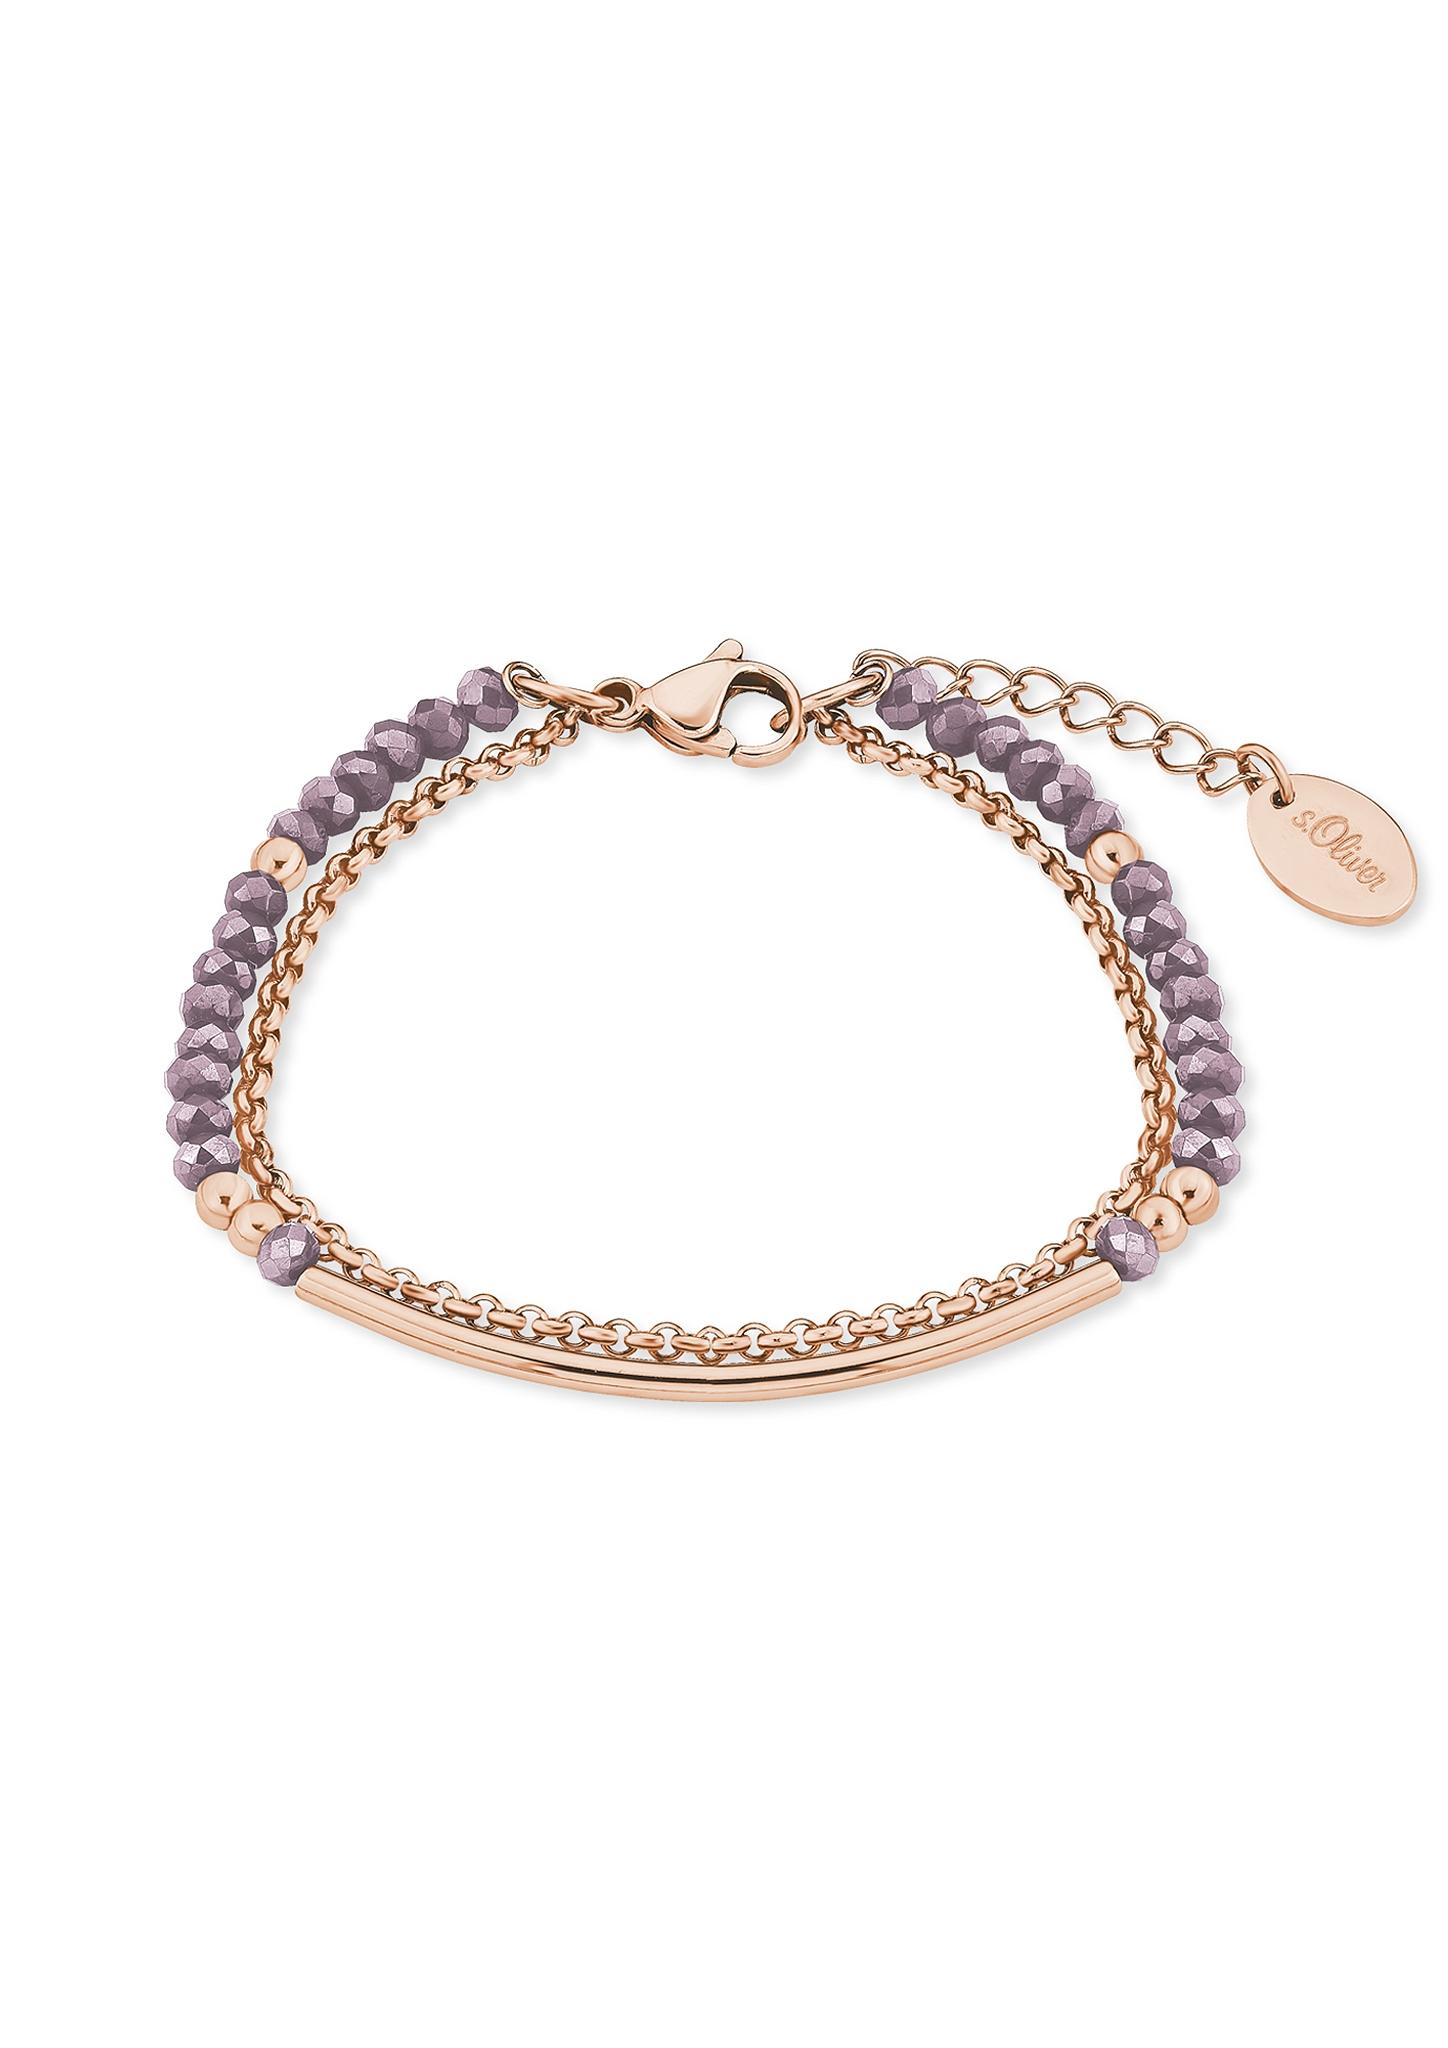 Armband   Schmuck > Armbänder > Sonstige Armbänder   Pink   Edelstahl ip roségold  glas   s.Oliver